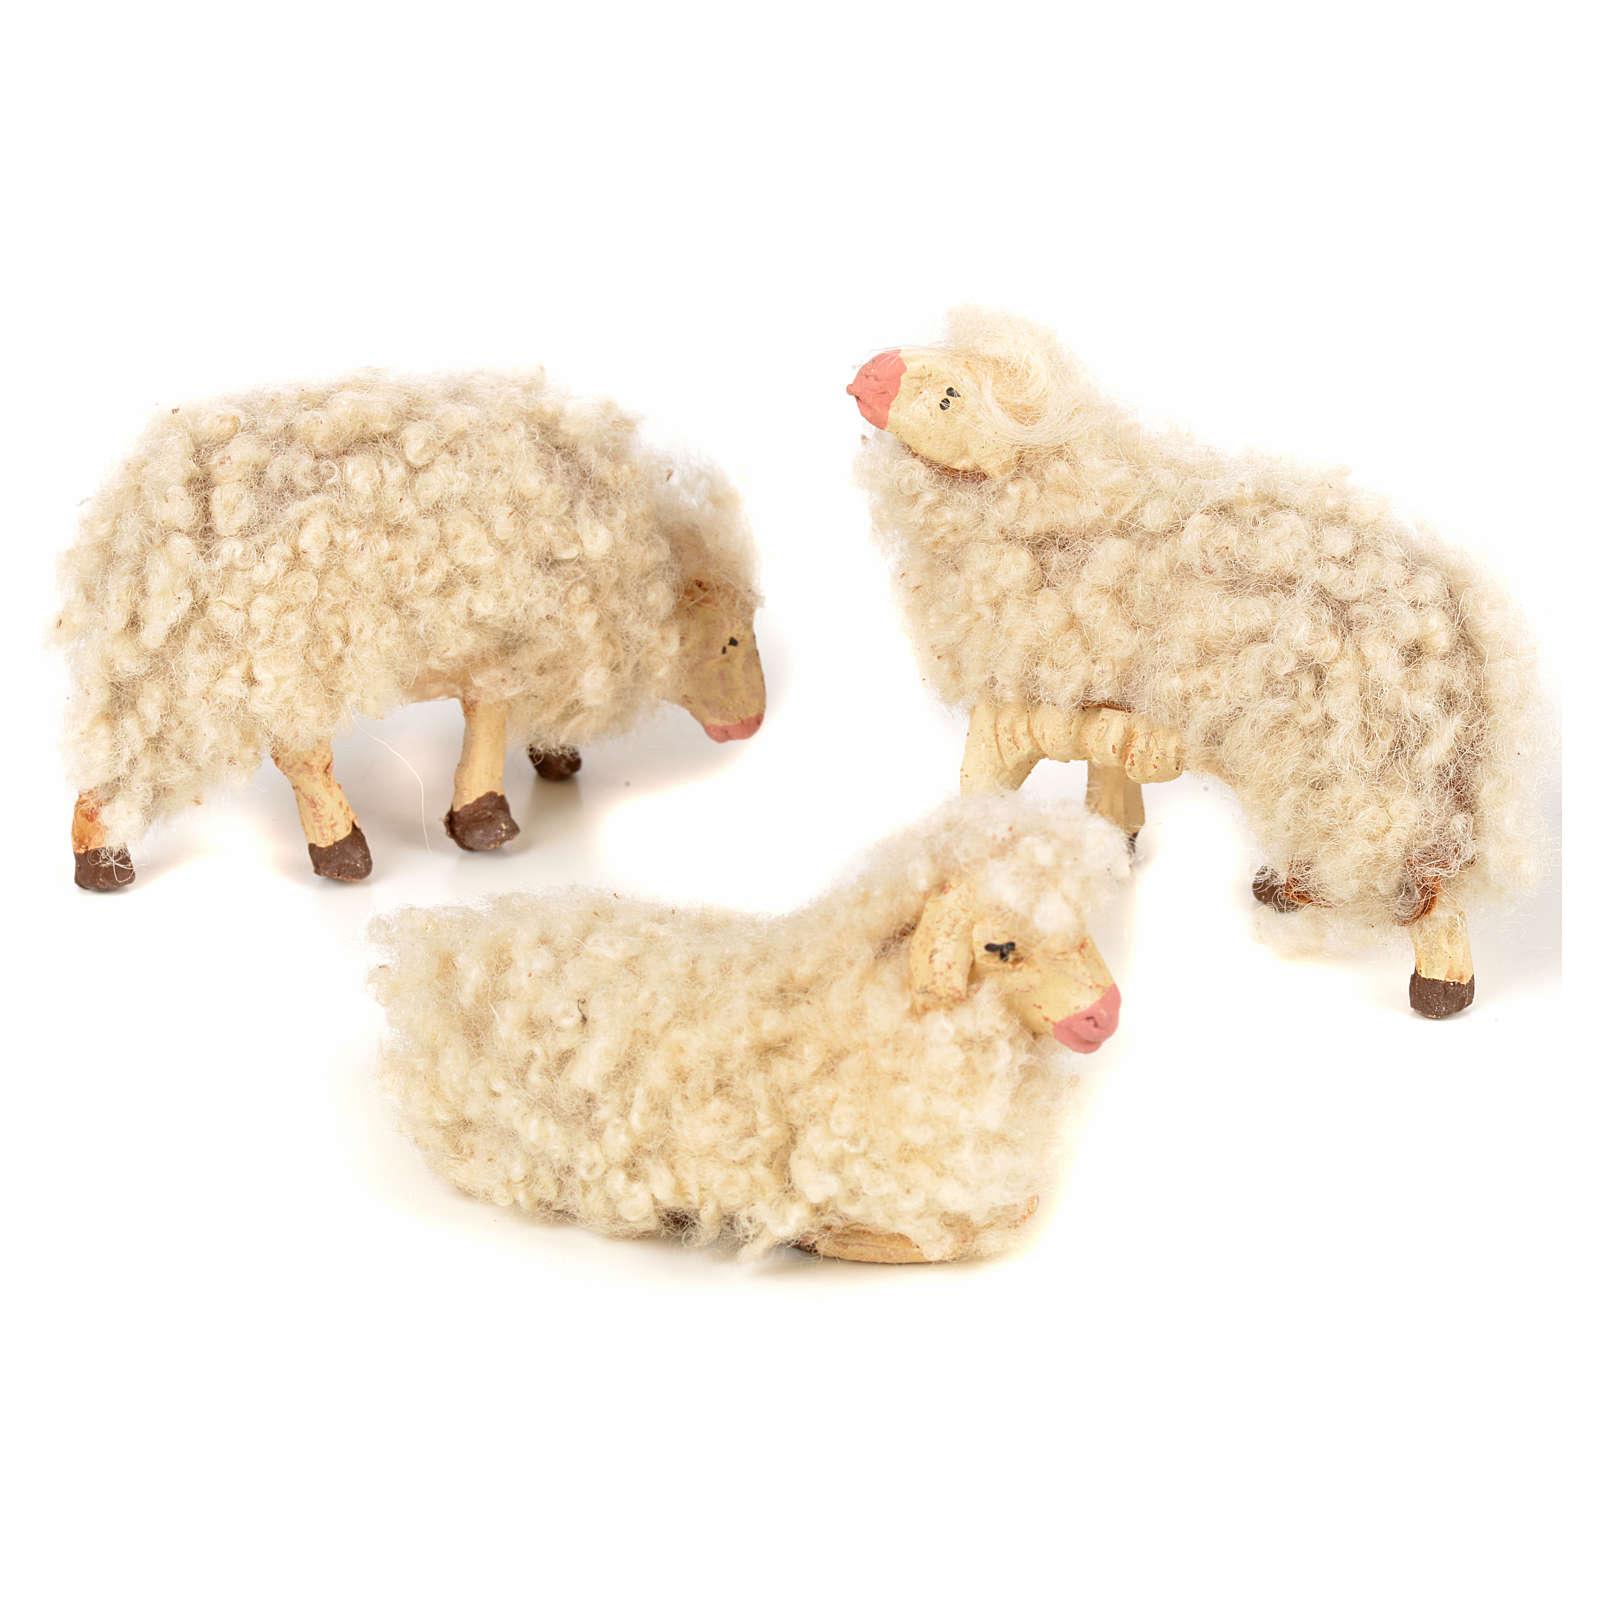 Kit 3 pecore con lana 12 cm presepe napoletano 4